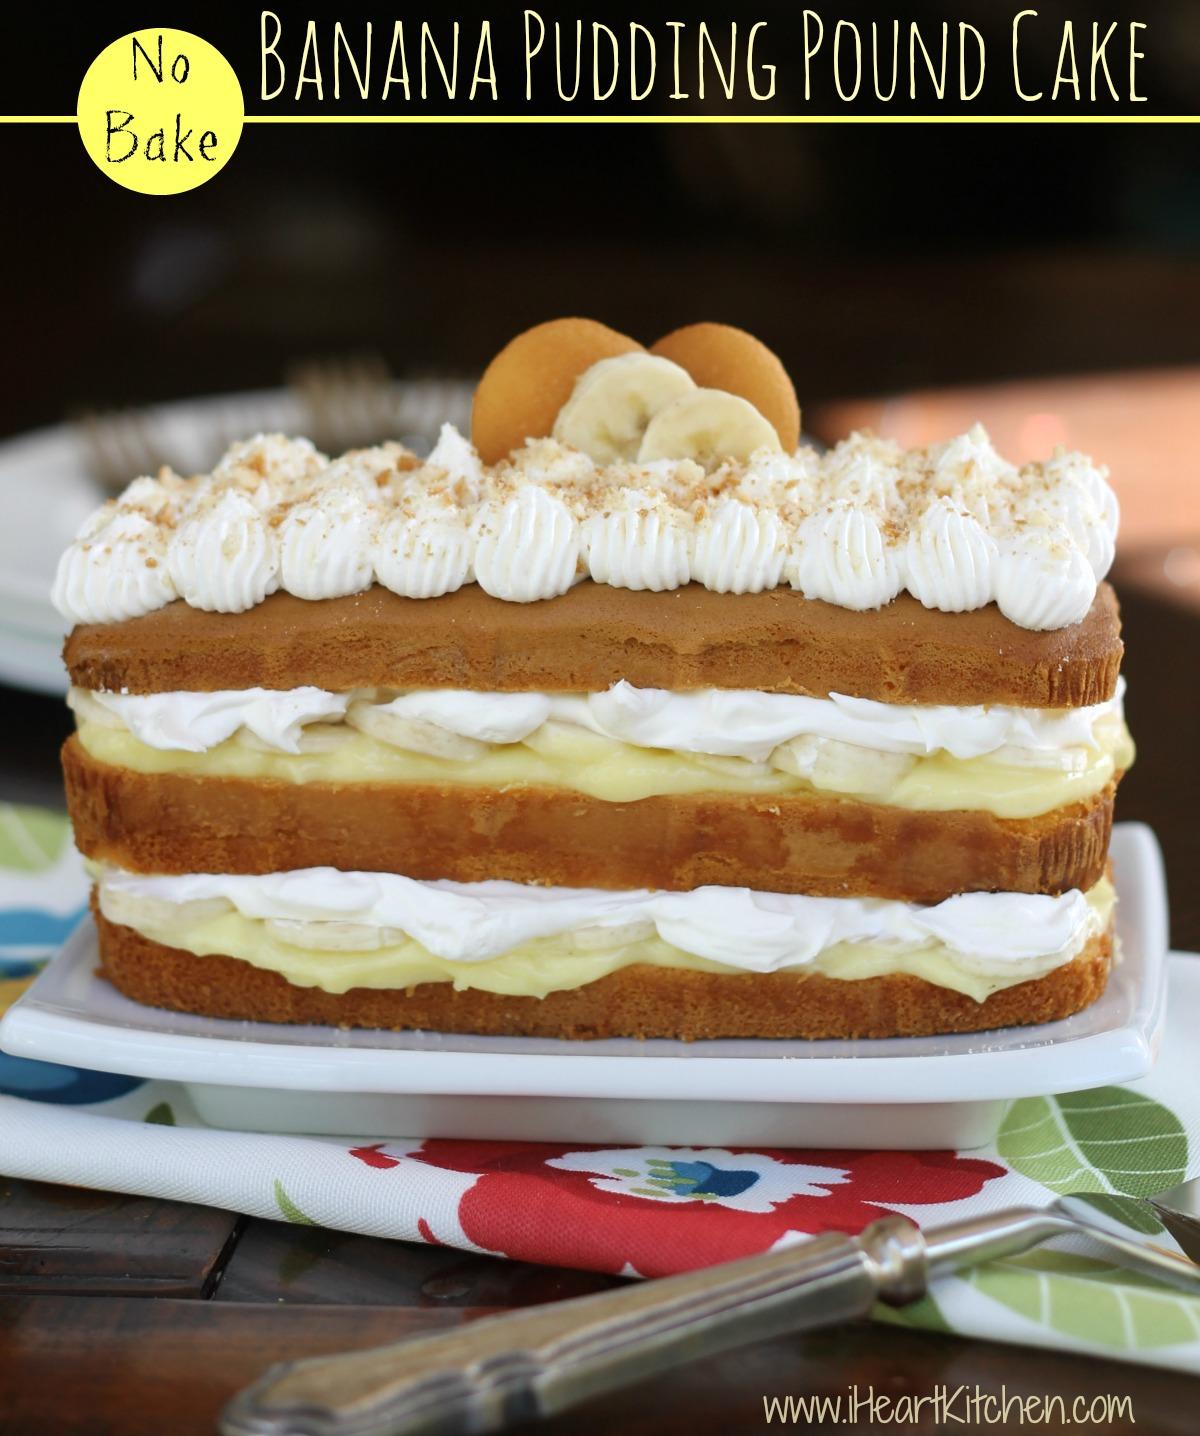 Banana Pudding Cake Images